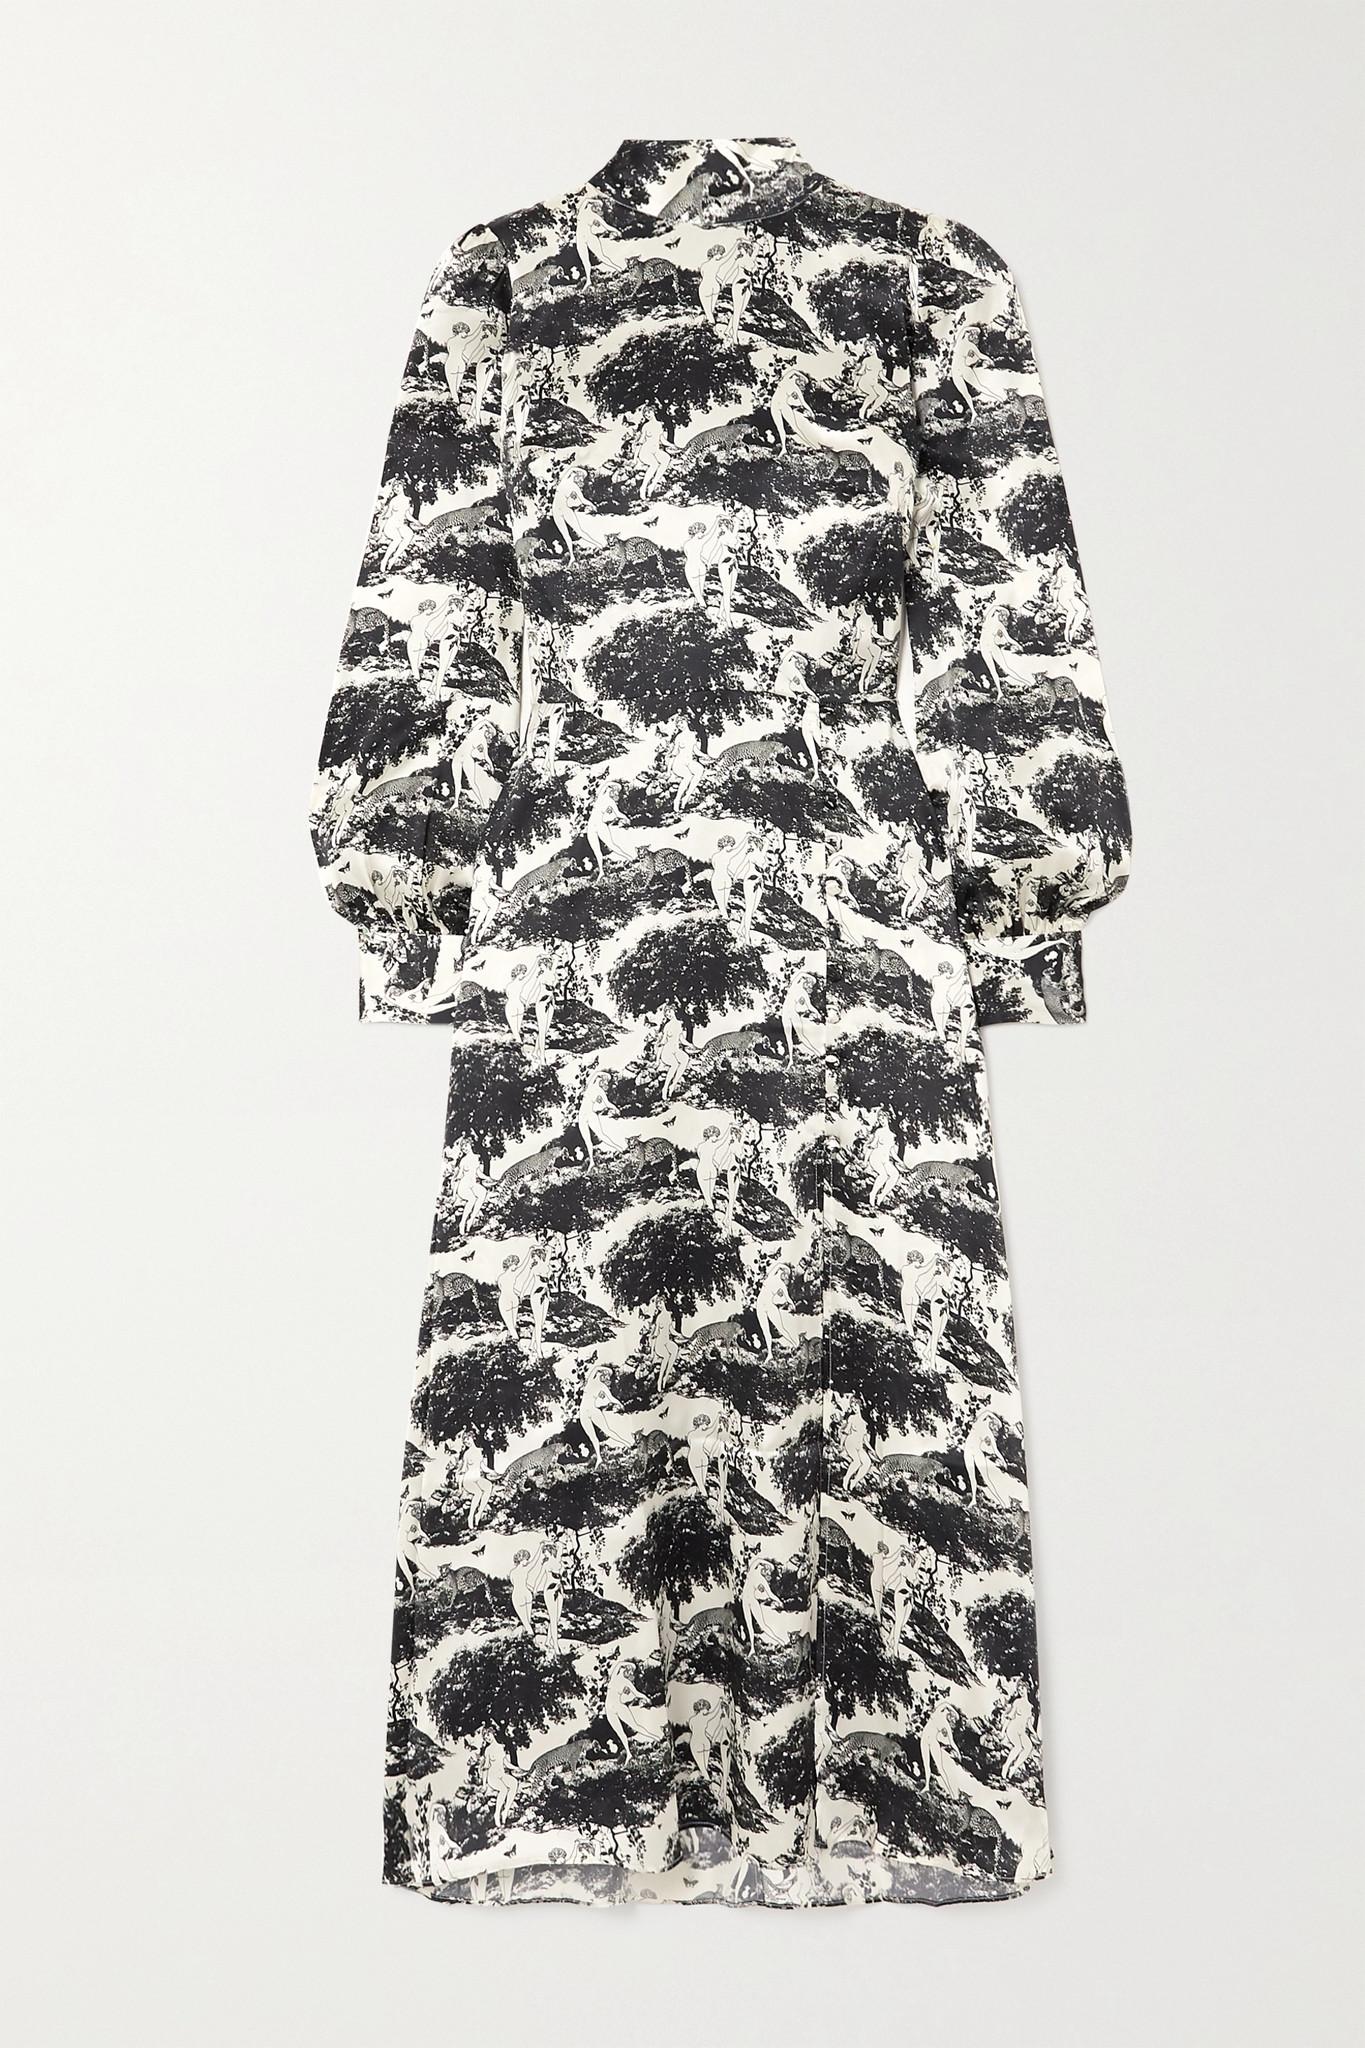 REFORMATION - Maple 印花丝缎中长连衣裙 - 白色 - US0